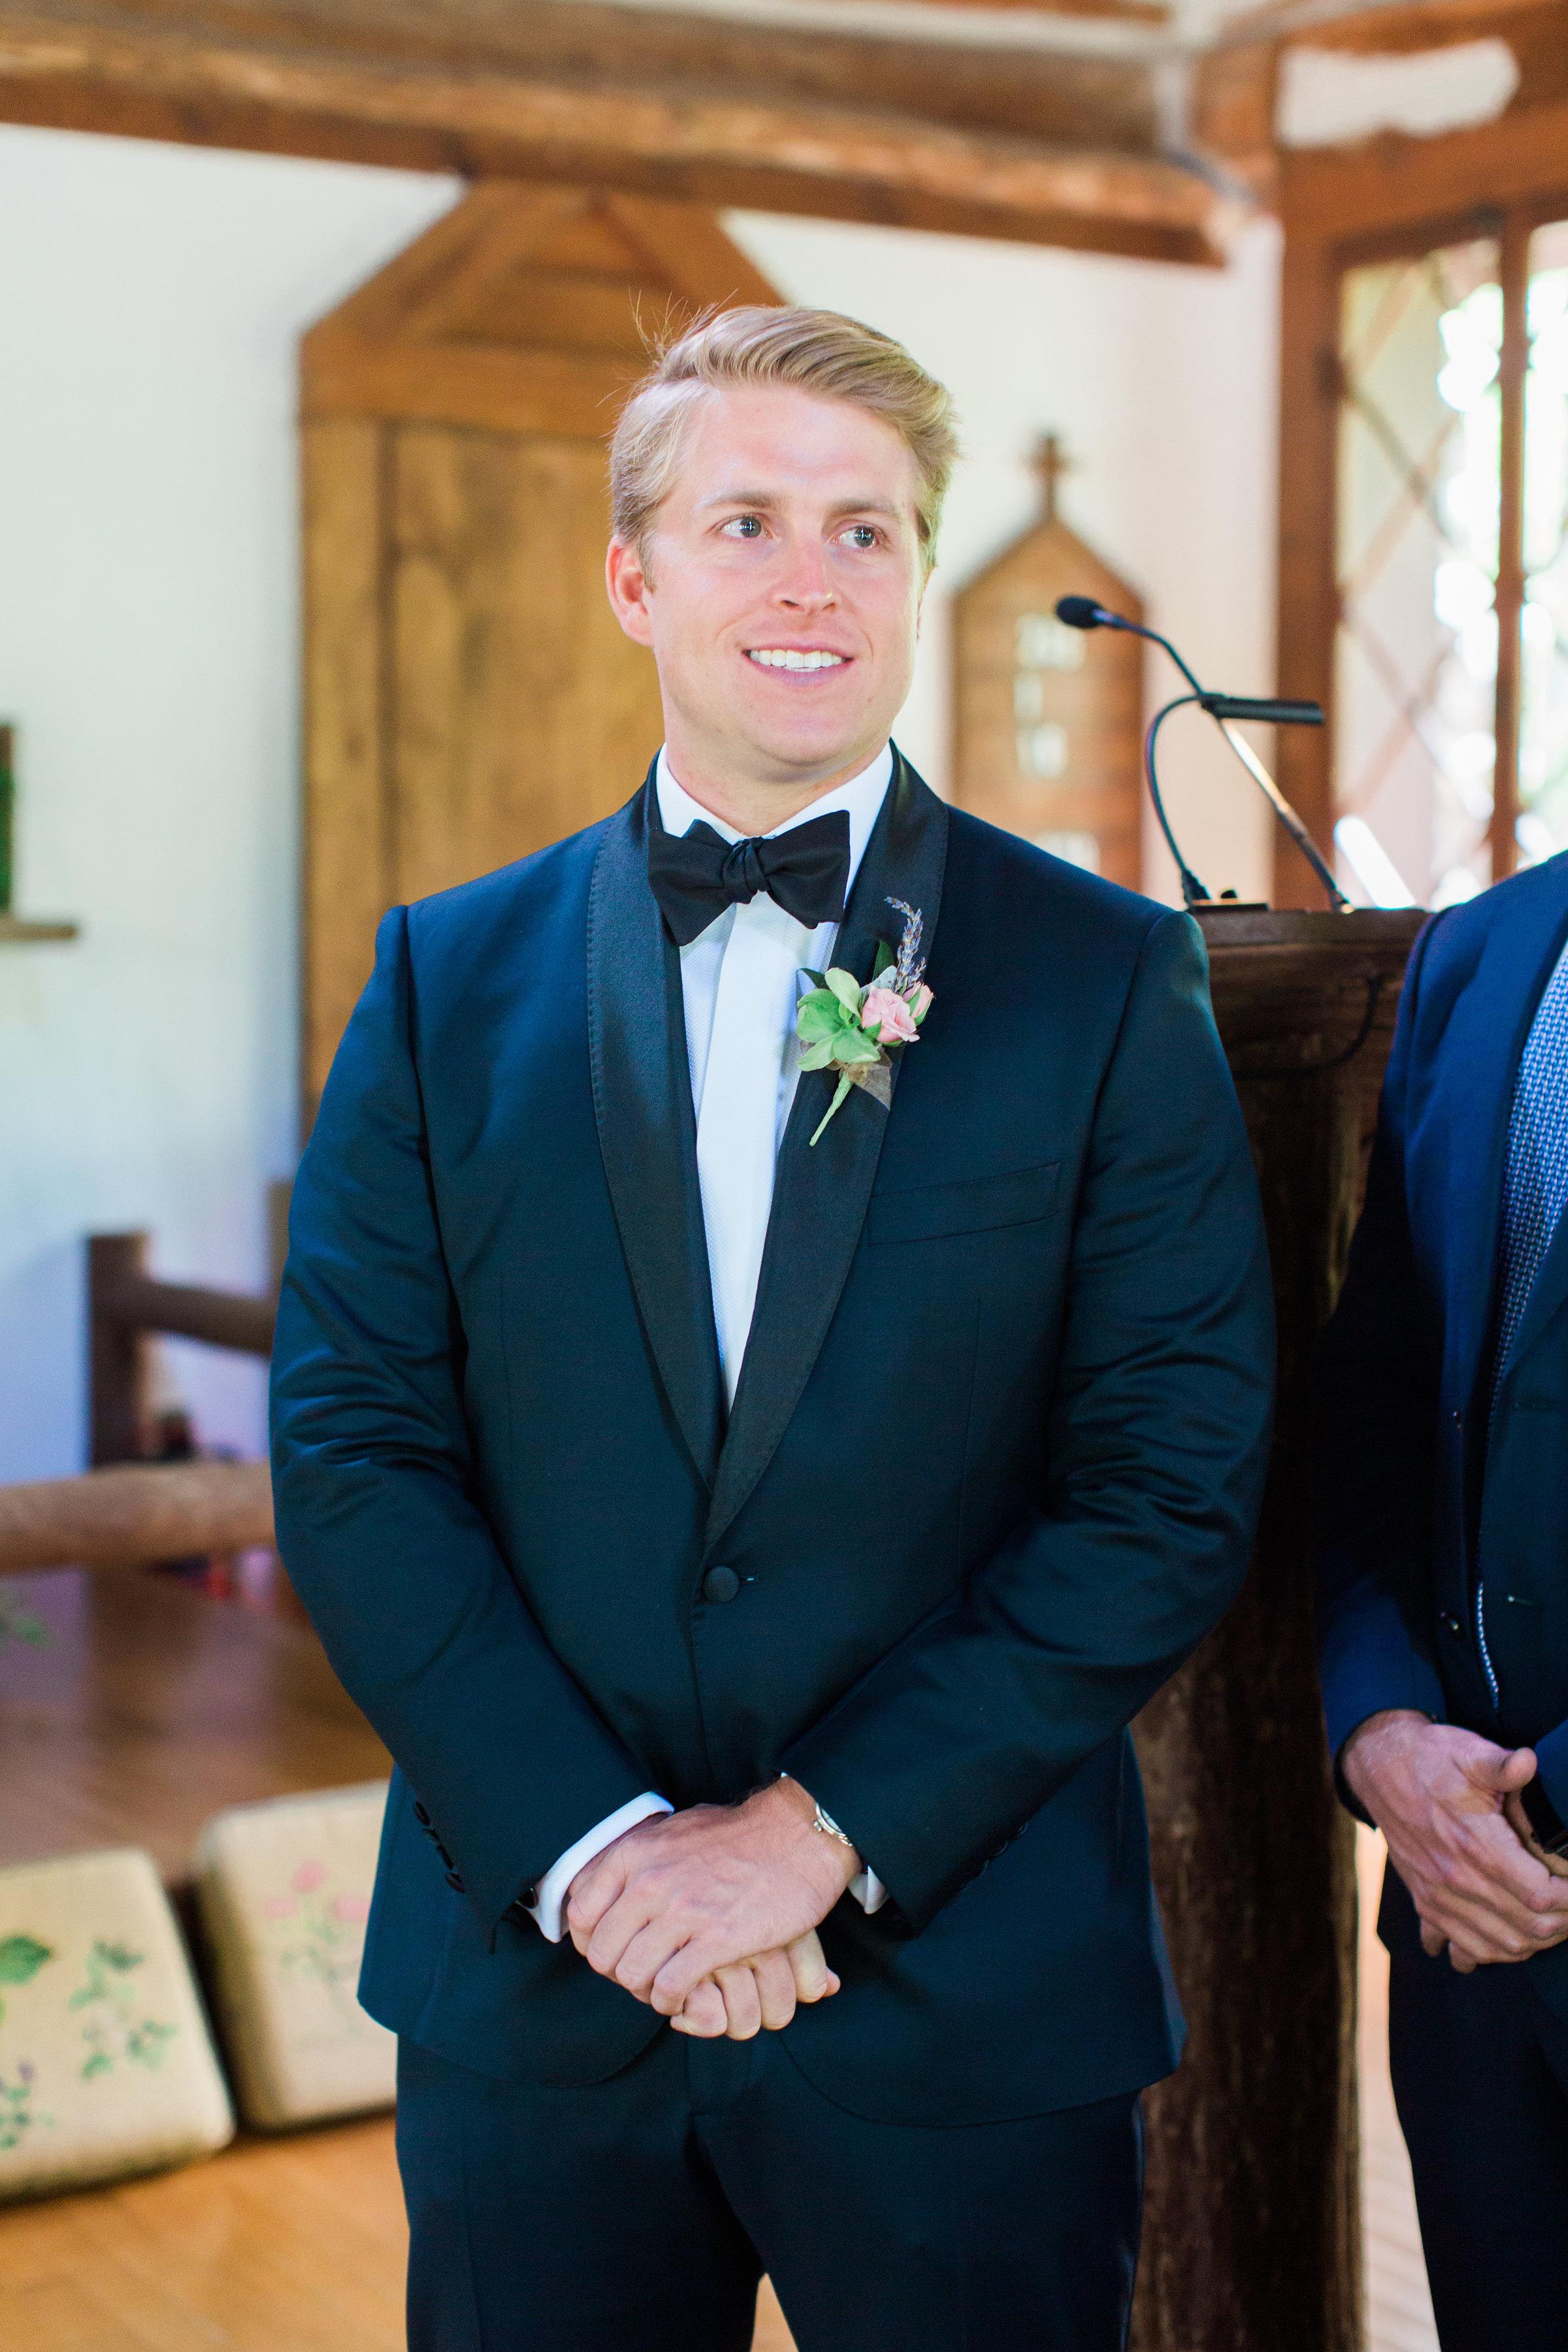 Coffman+Wedding+Ceremony-56.jpg